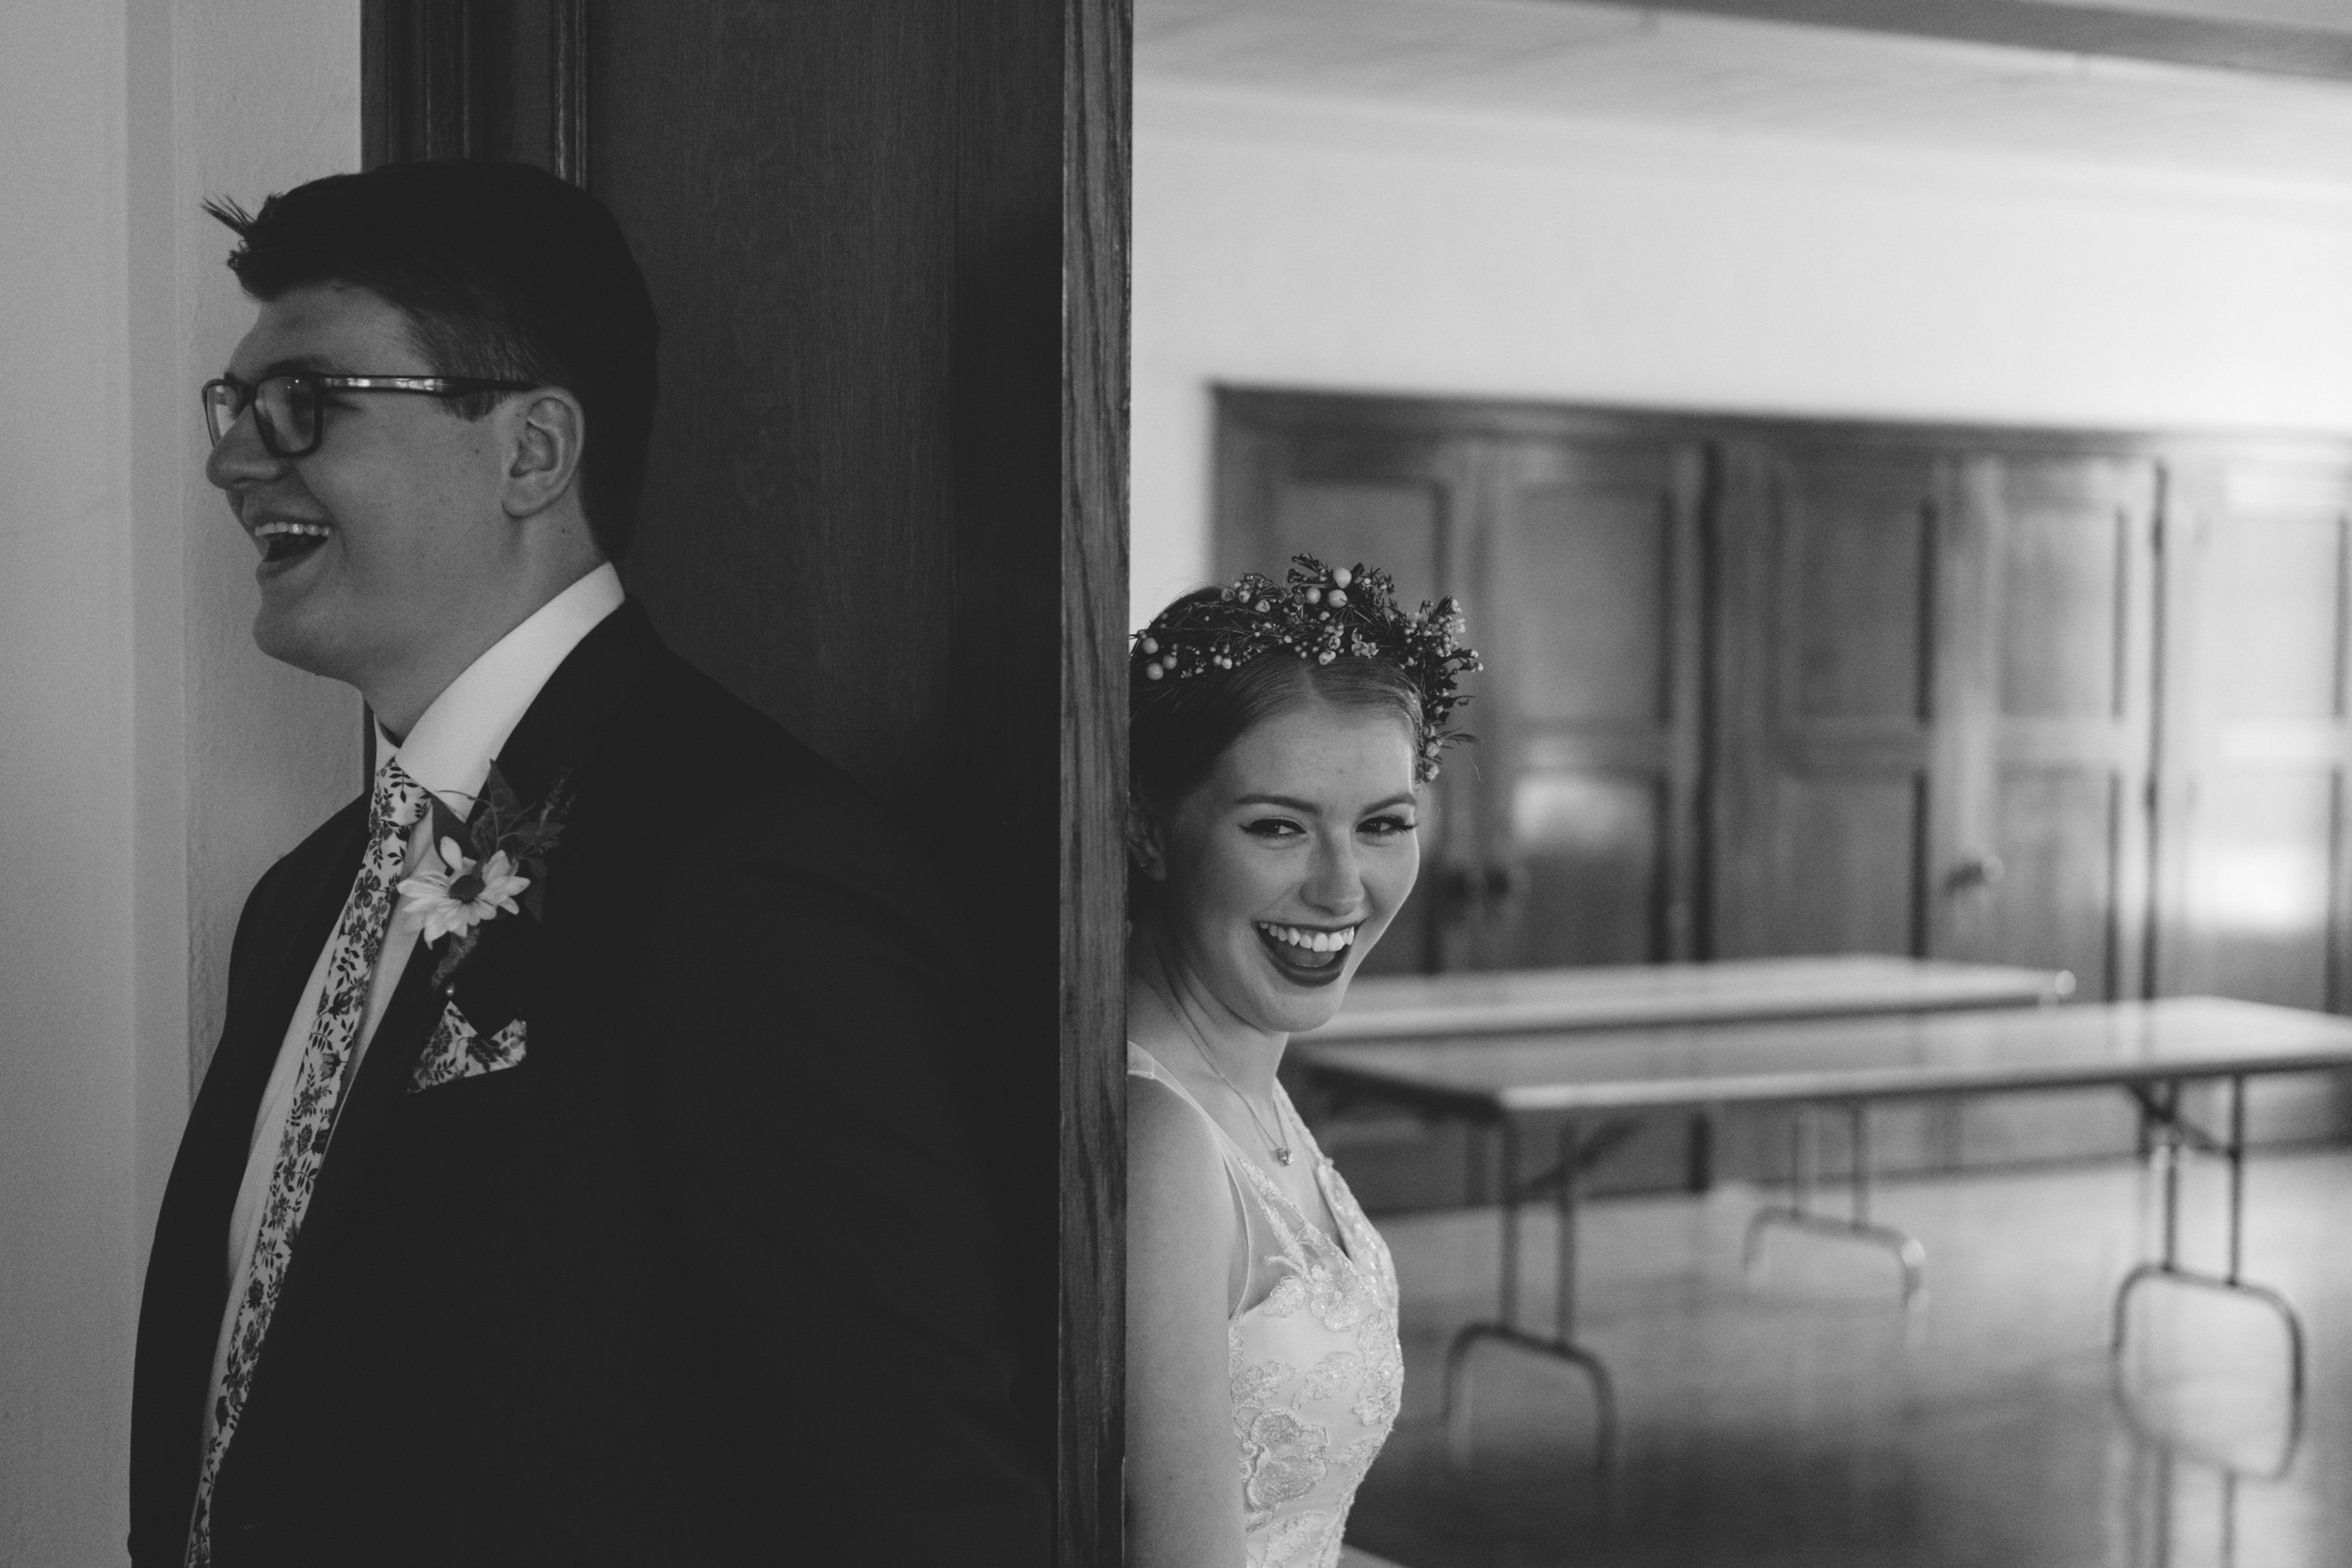 Bride and groom's blind prayer before wedding ceremony